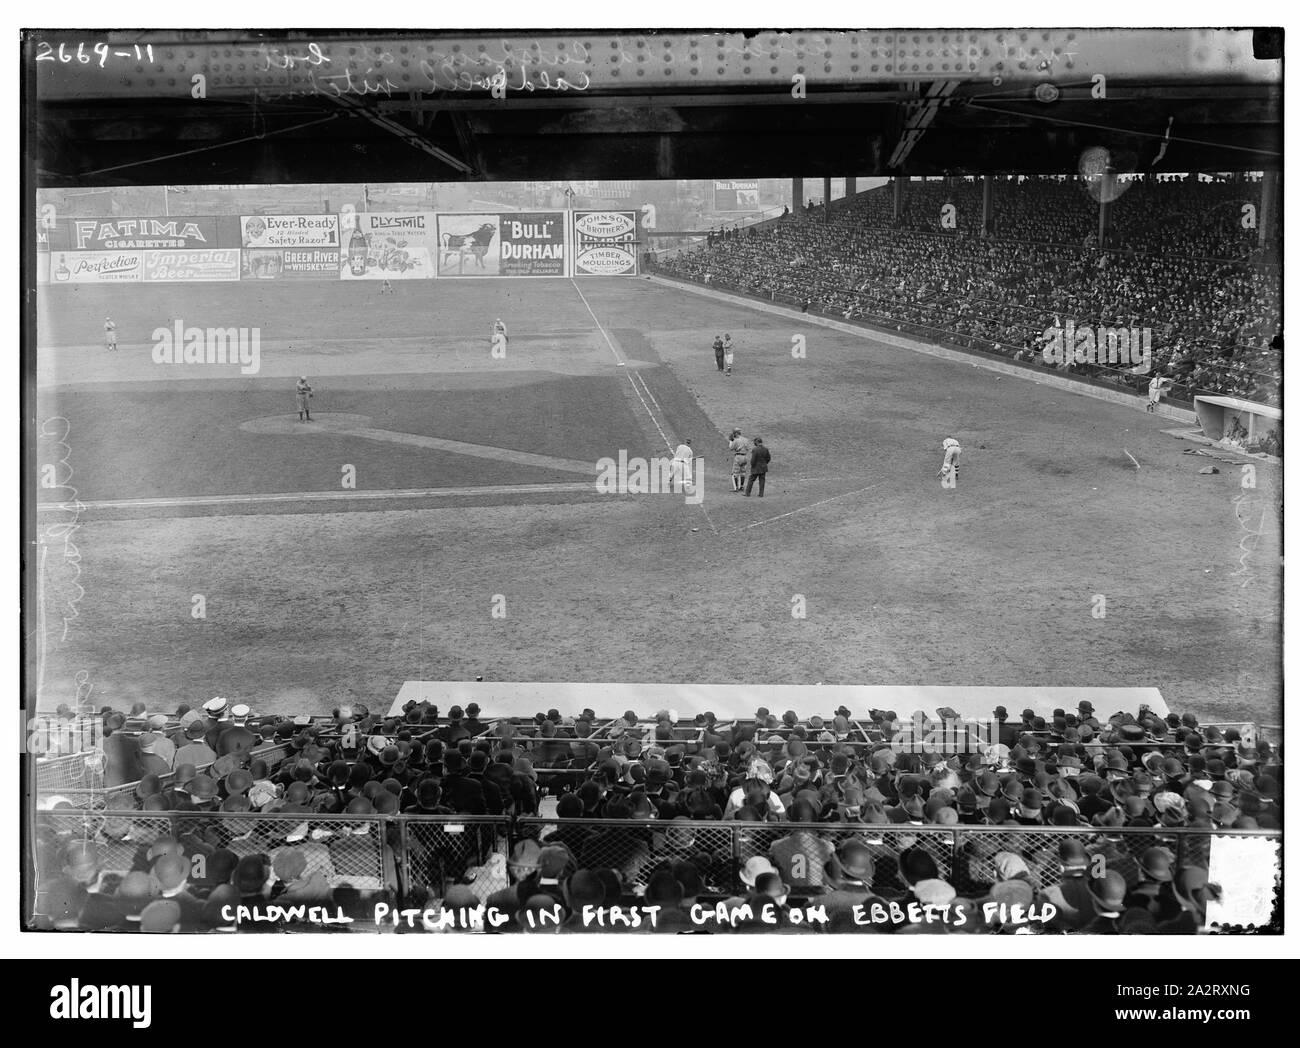 MLB Brooklyn Dodgers Vintage Ebbets Field 1913 Baseball Tee Shirt